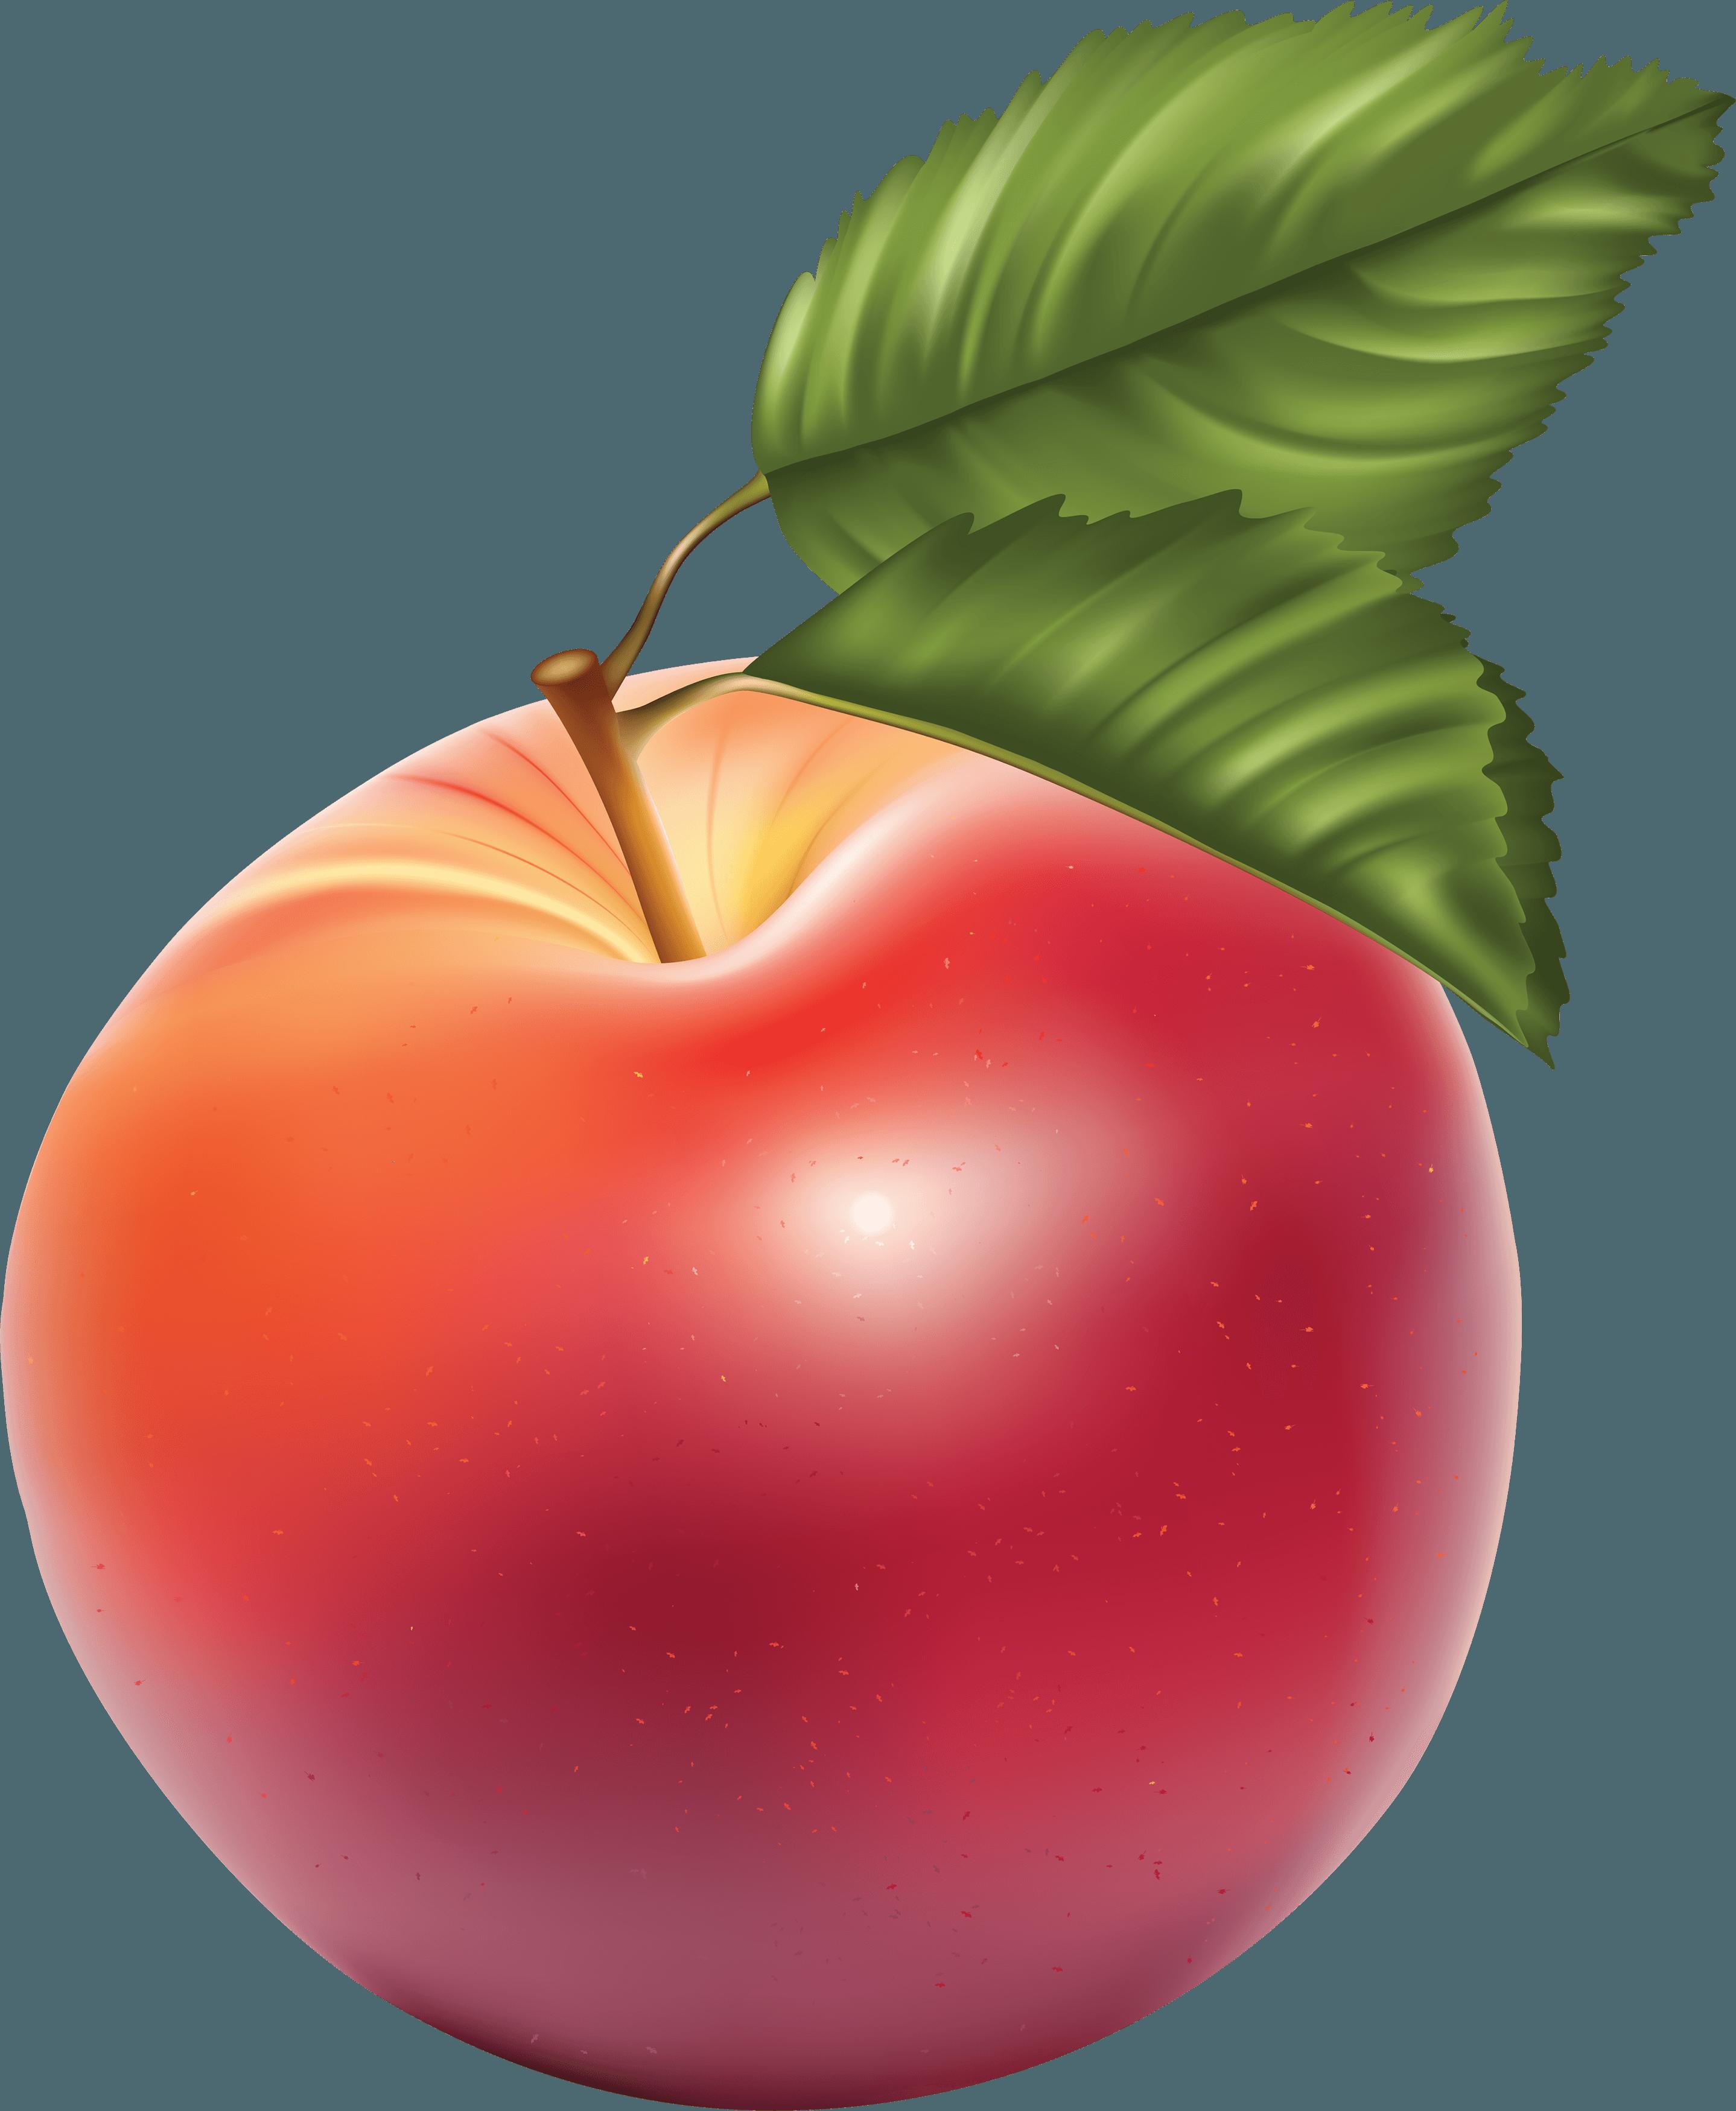 png image transparent. Fruit clipart star apple